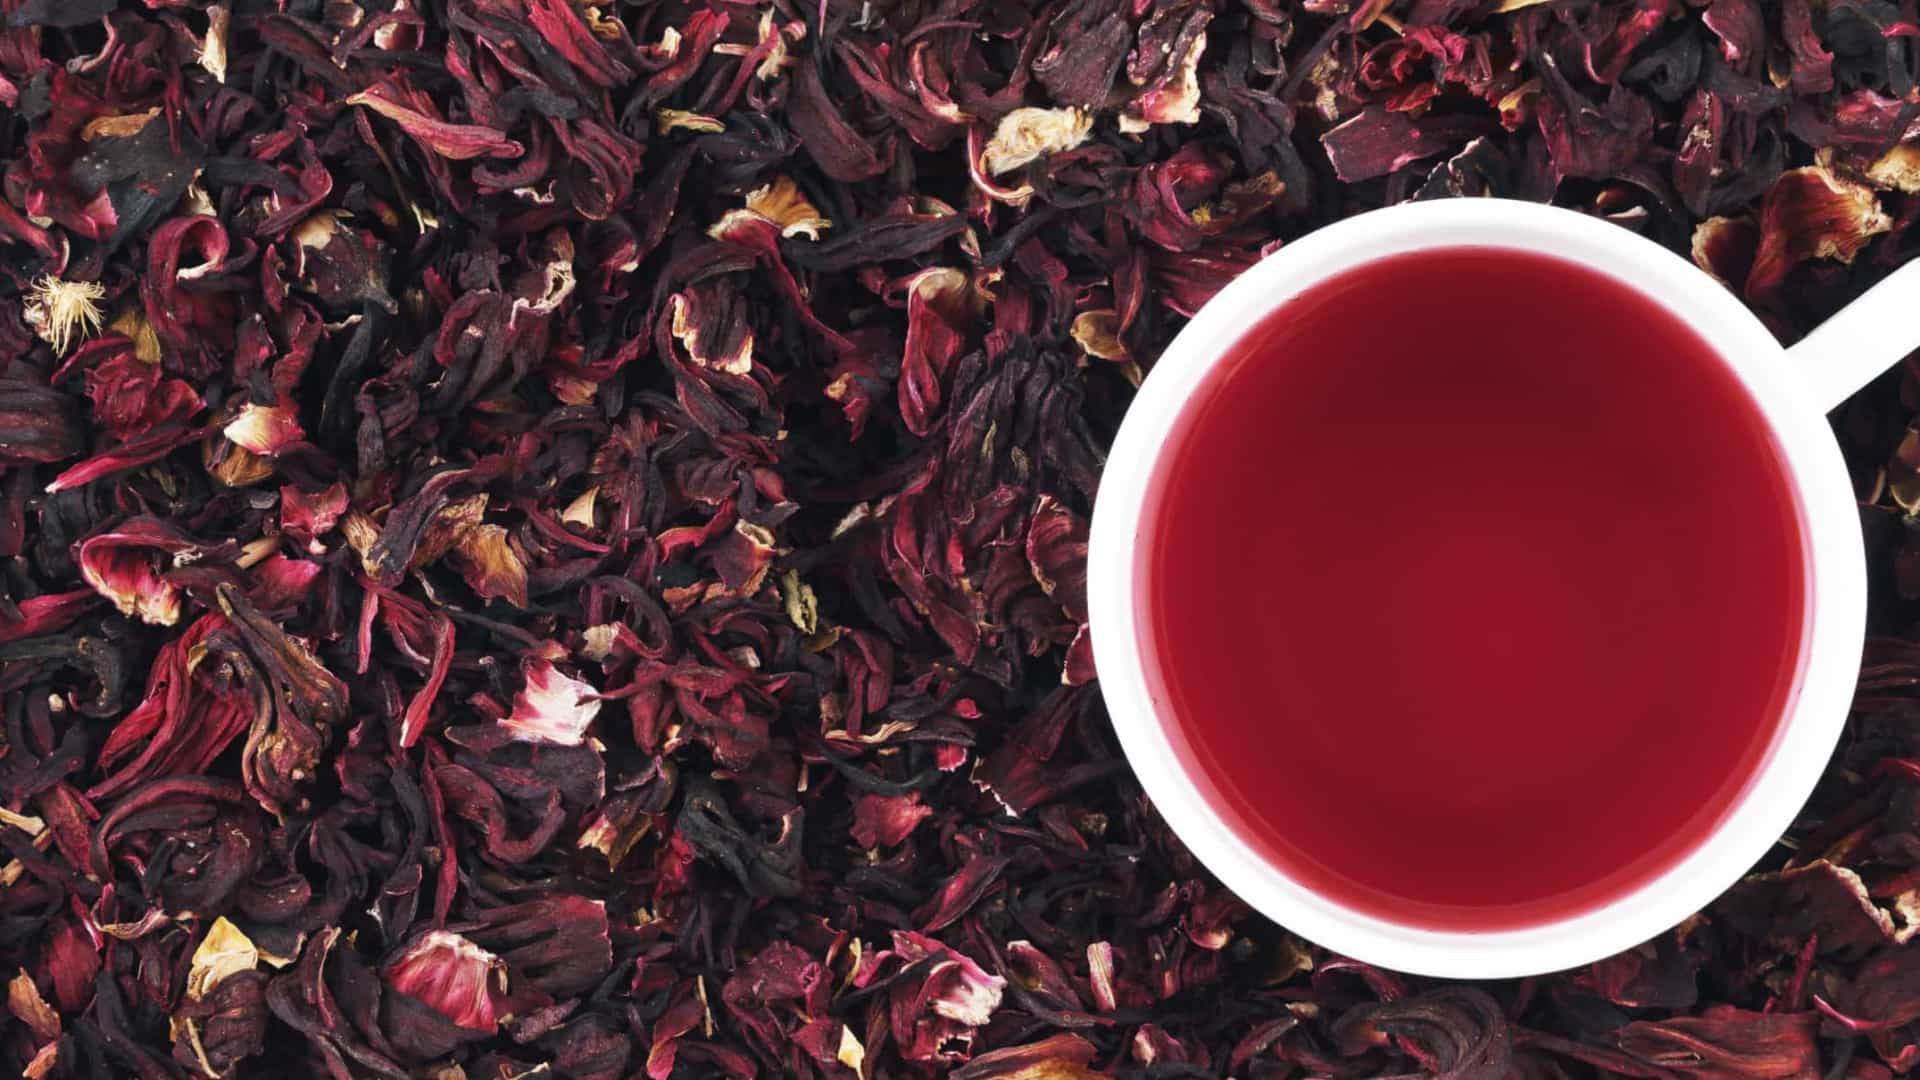 Chá de hibisco, um poço de saúde que pode ser saboreado quente ou gelado